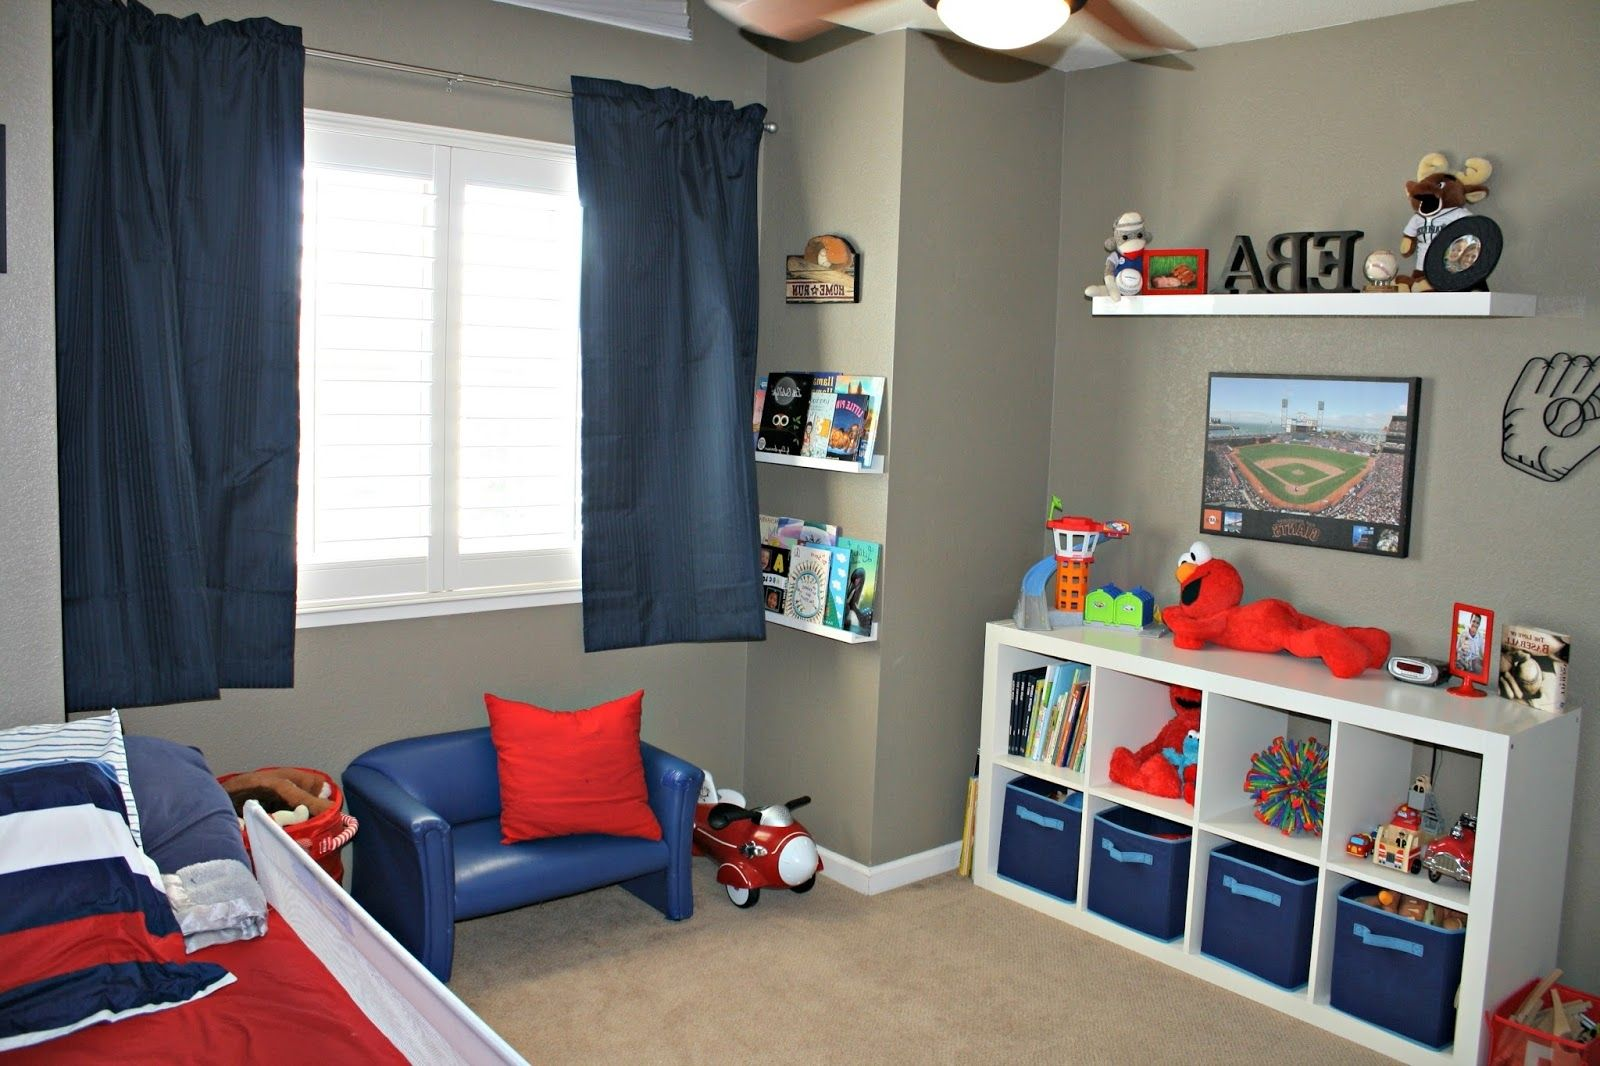 Boy Bedroom Ideas - Visi Build 3D